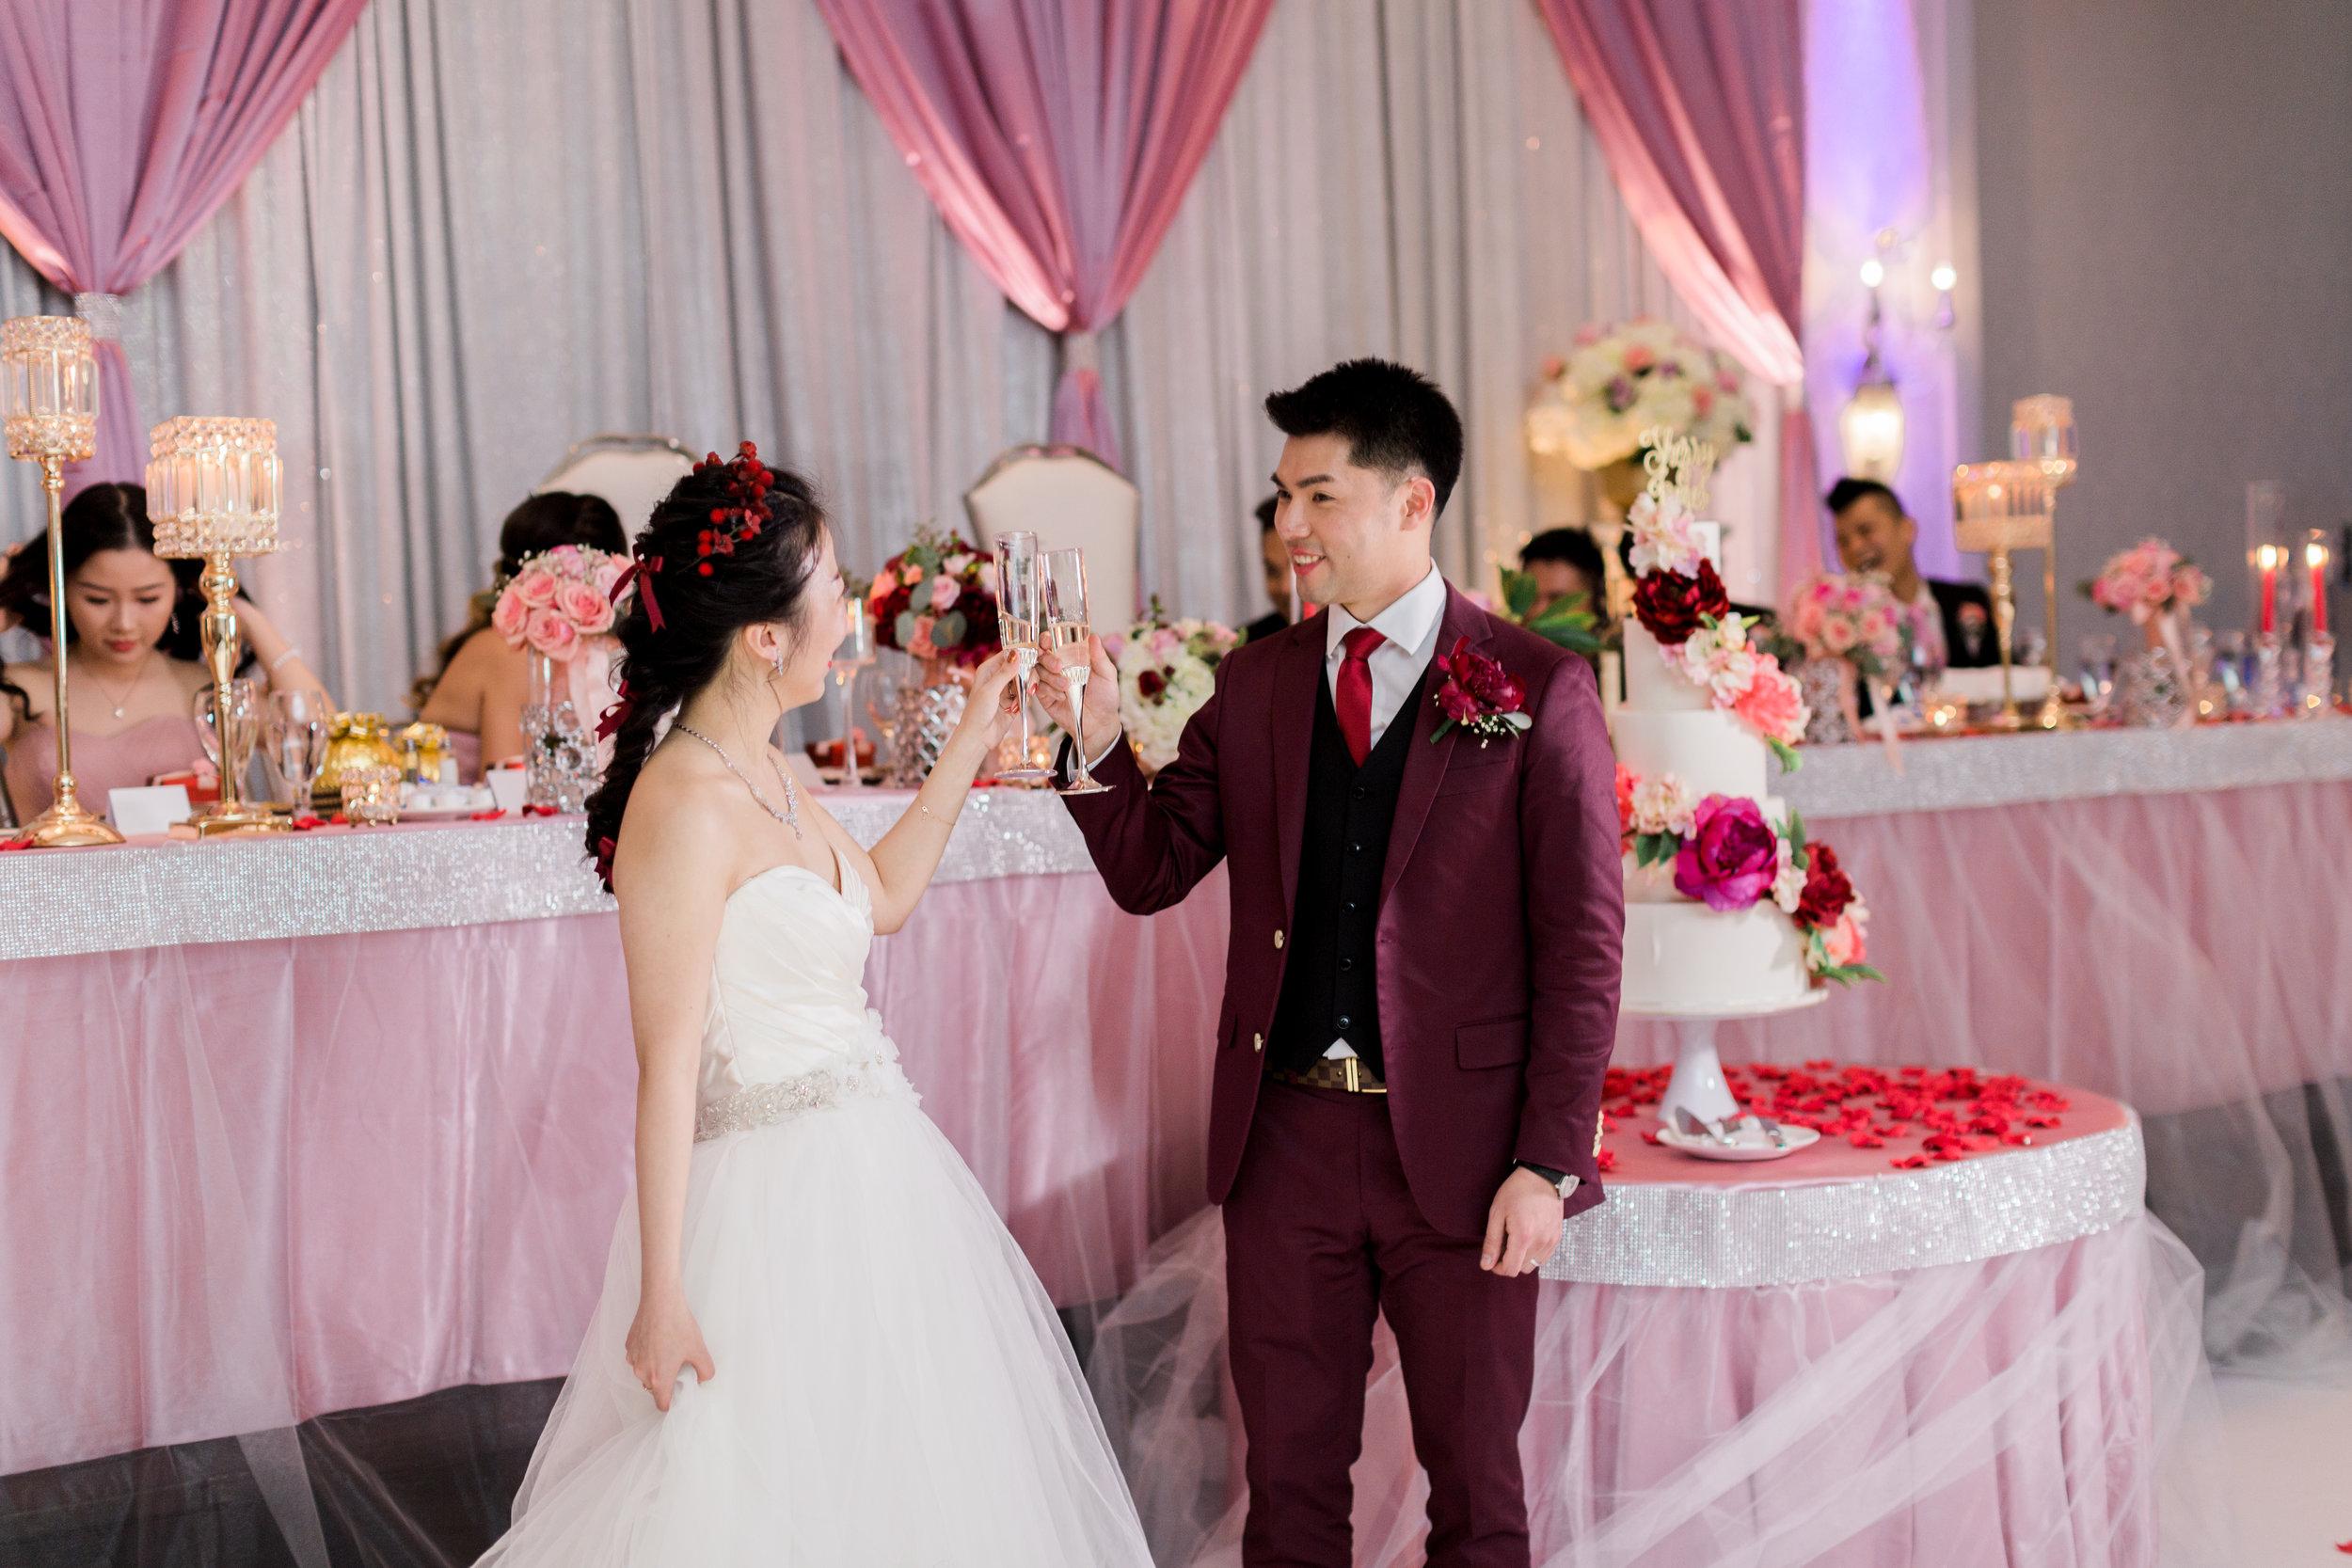 Parkview Manor Wedding - Reception-71.jpg